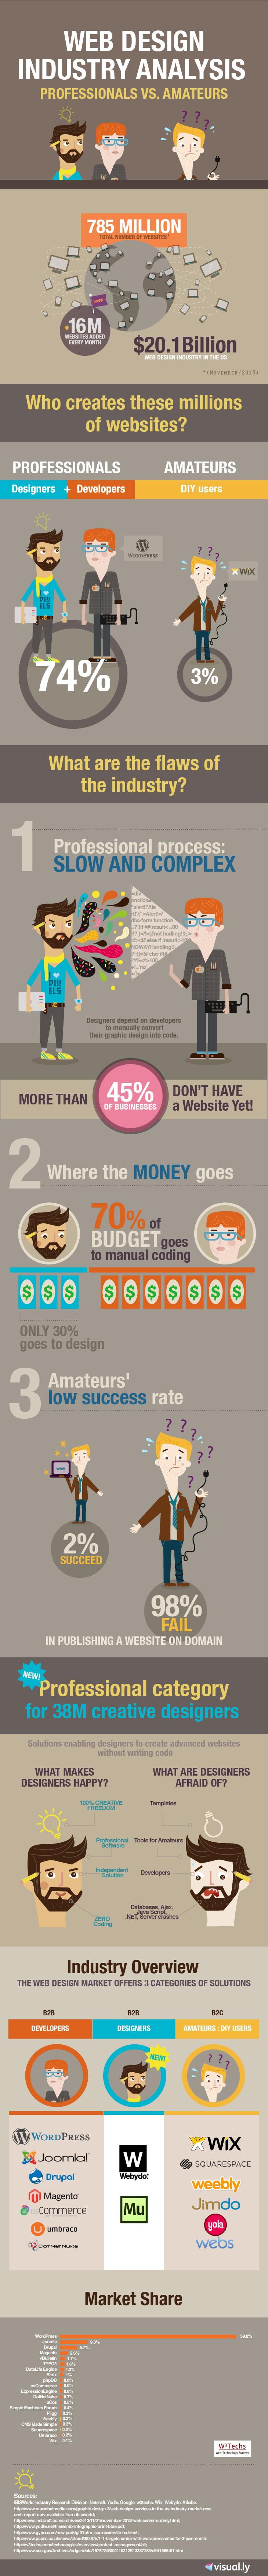 web design industry analysis